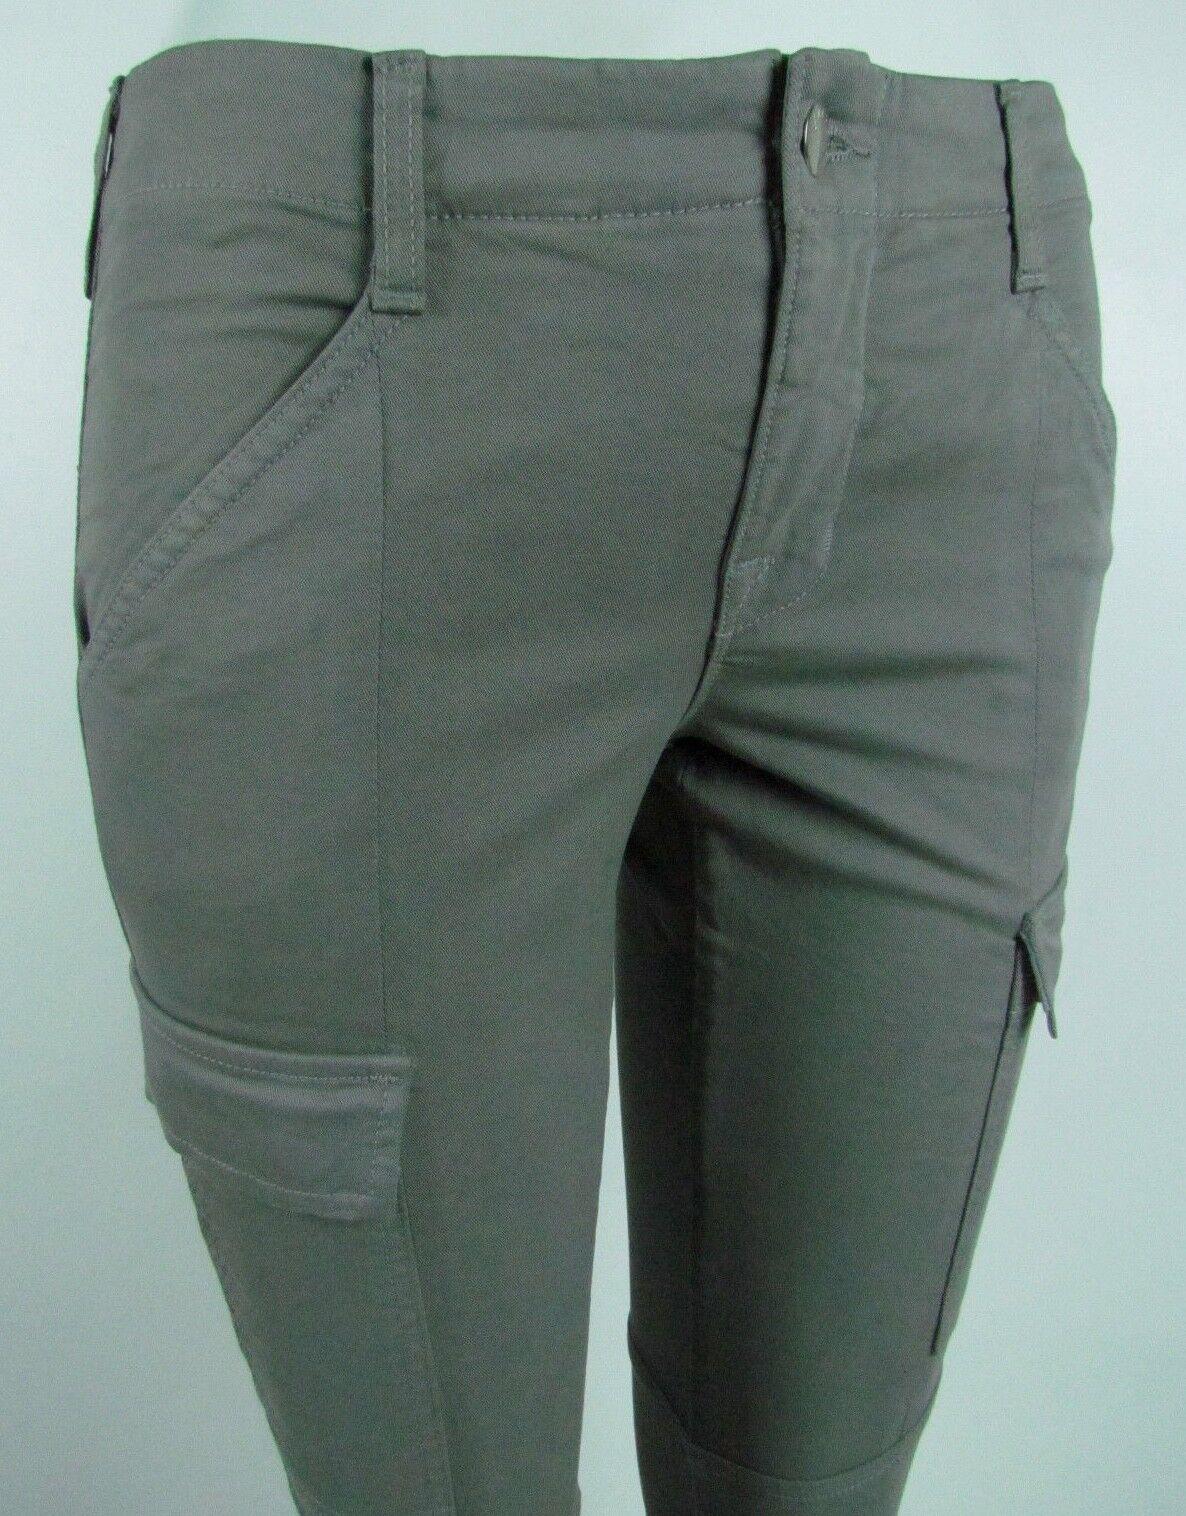 J BRAND HOULIHAN SKINNY CARGO Woman's Mid rise Jeans SZ 26 in VINTAGE DIM GREY